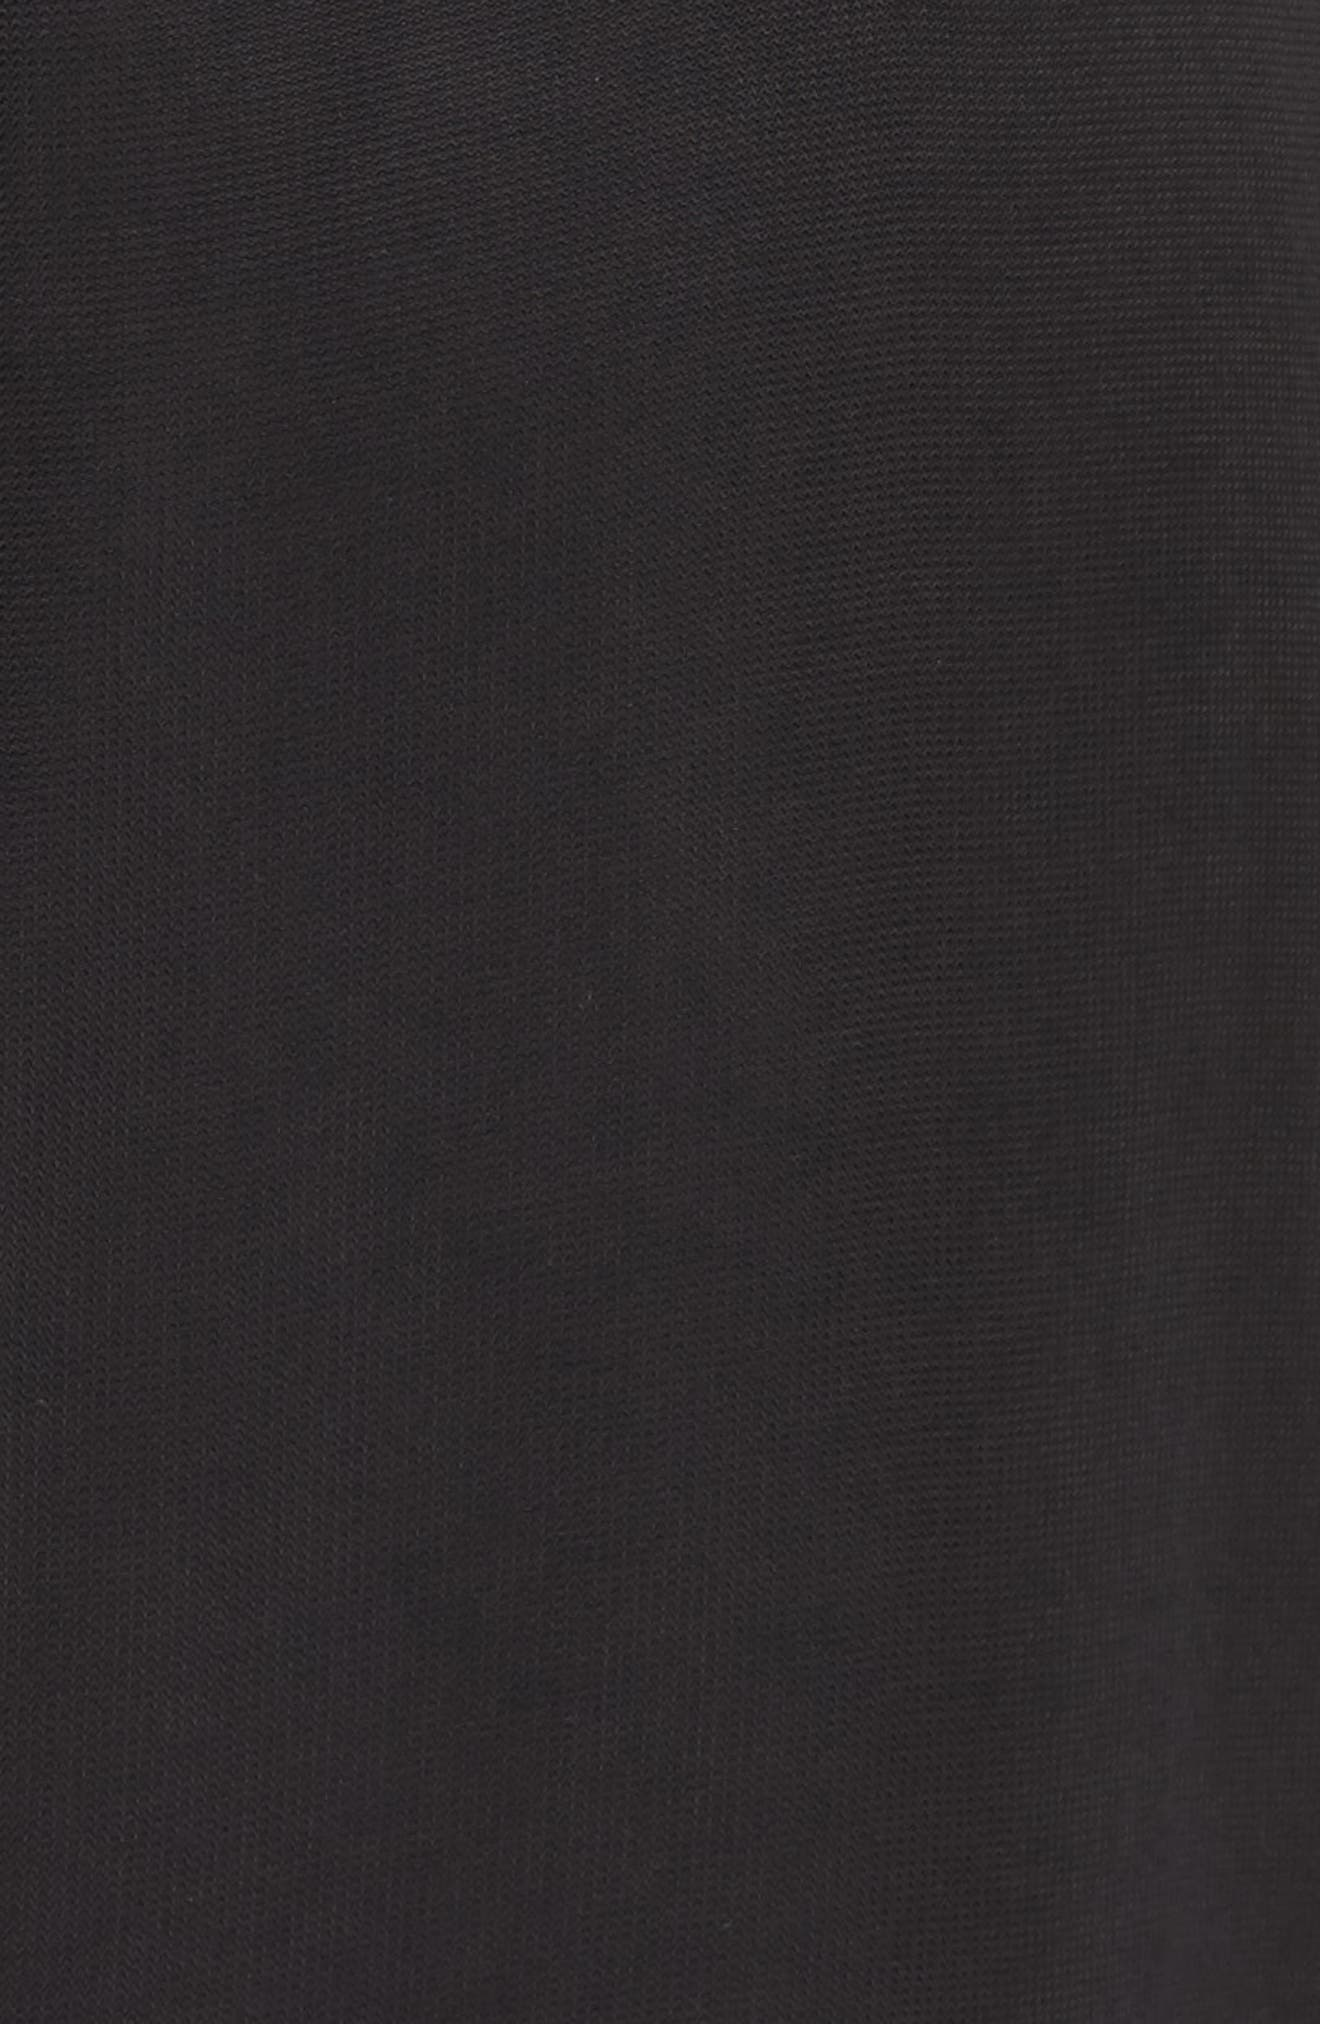 Mira Ruffle Minidress,                             Alternate thumbnail 5, color,                             001